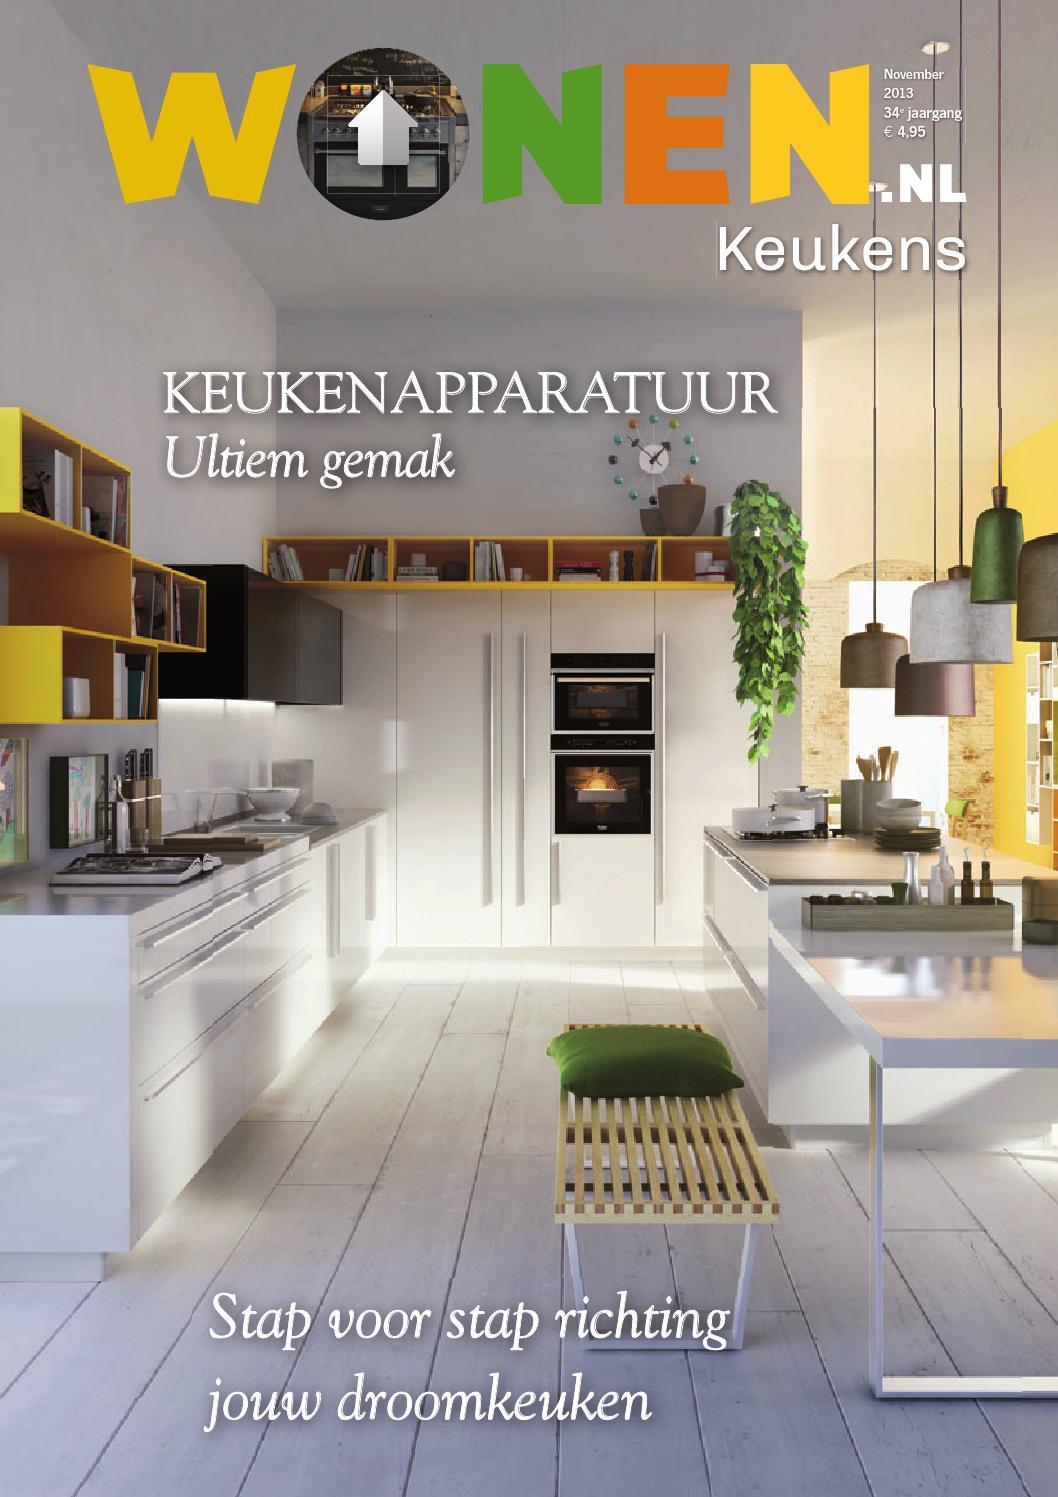 Wonen.nl keukens by wonen media   issuu